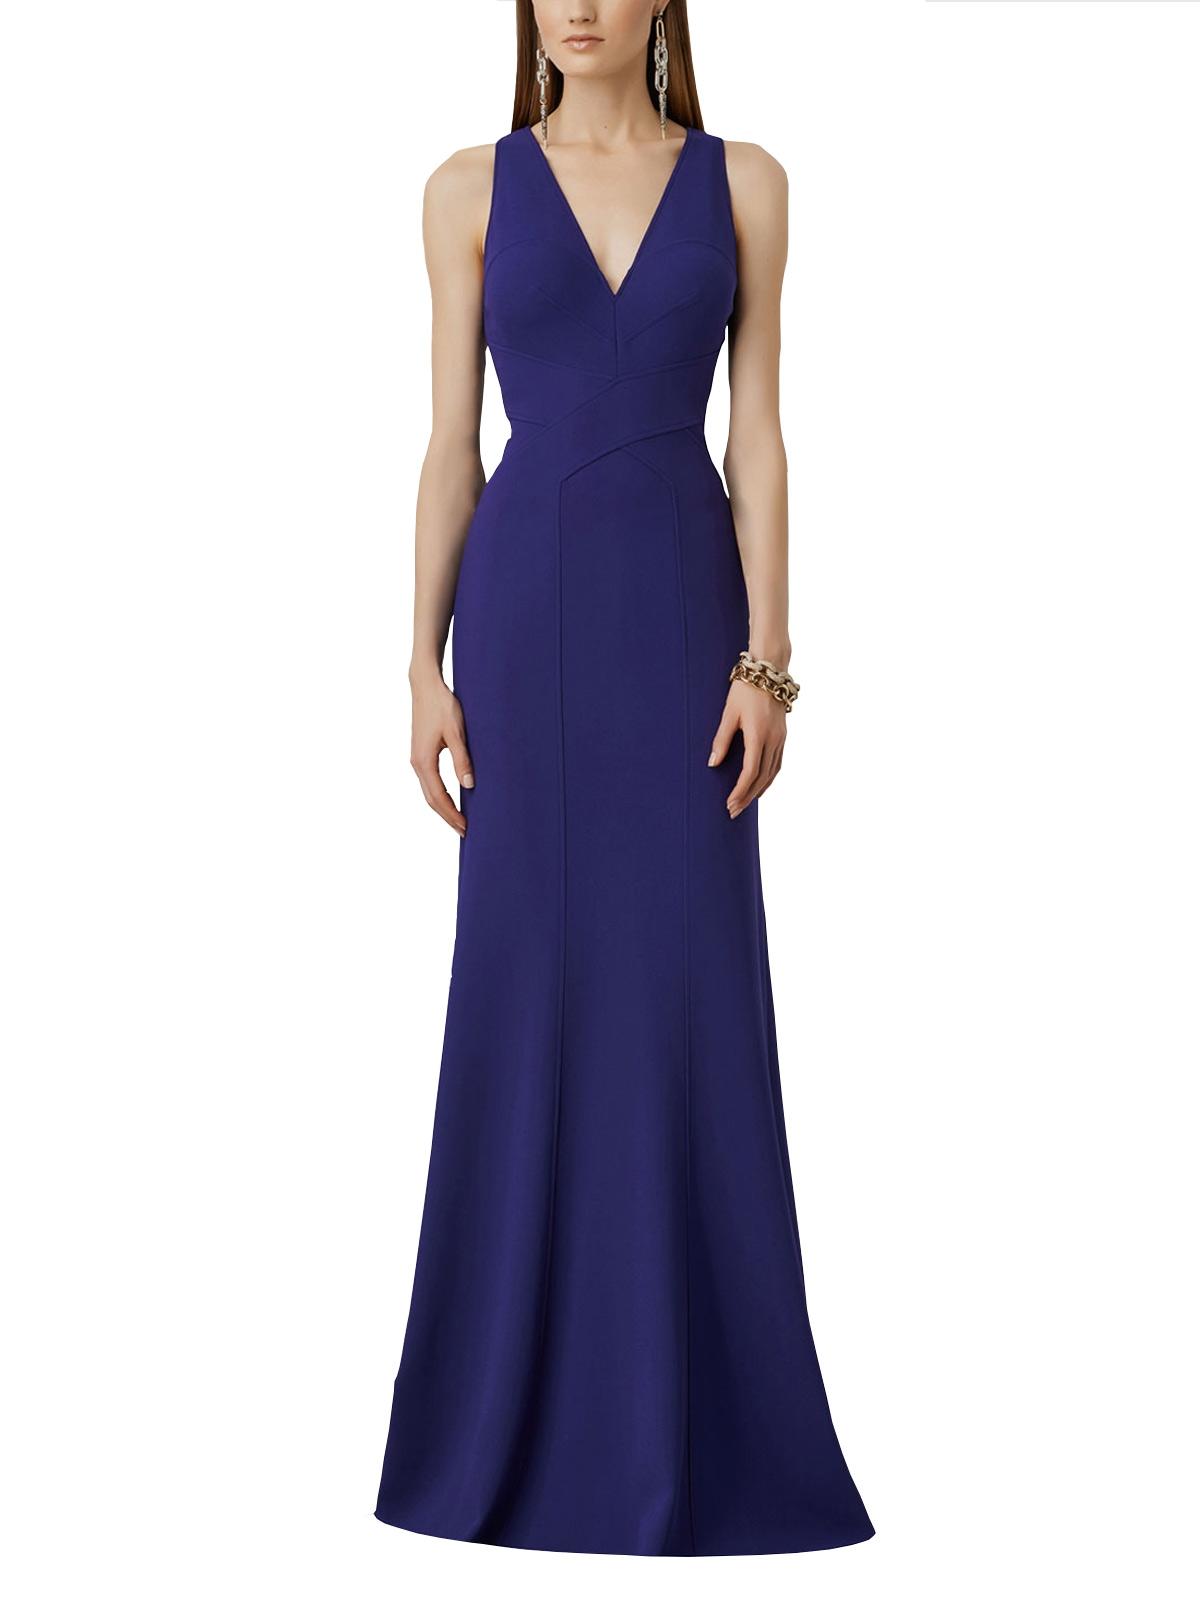 David meister gowns : Best Deals